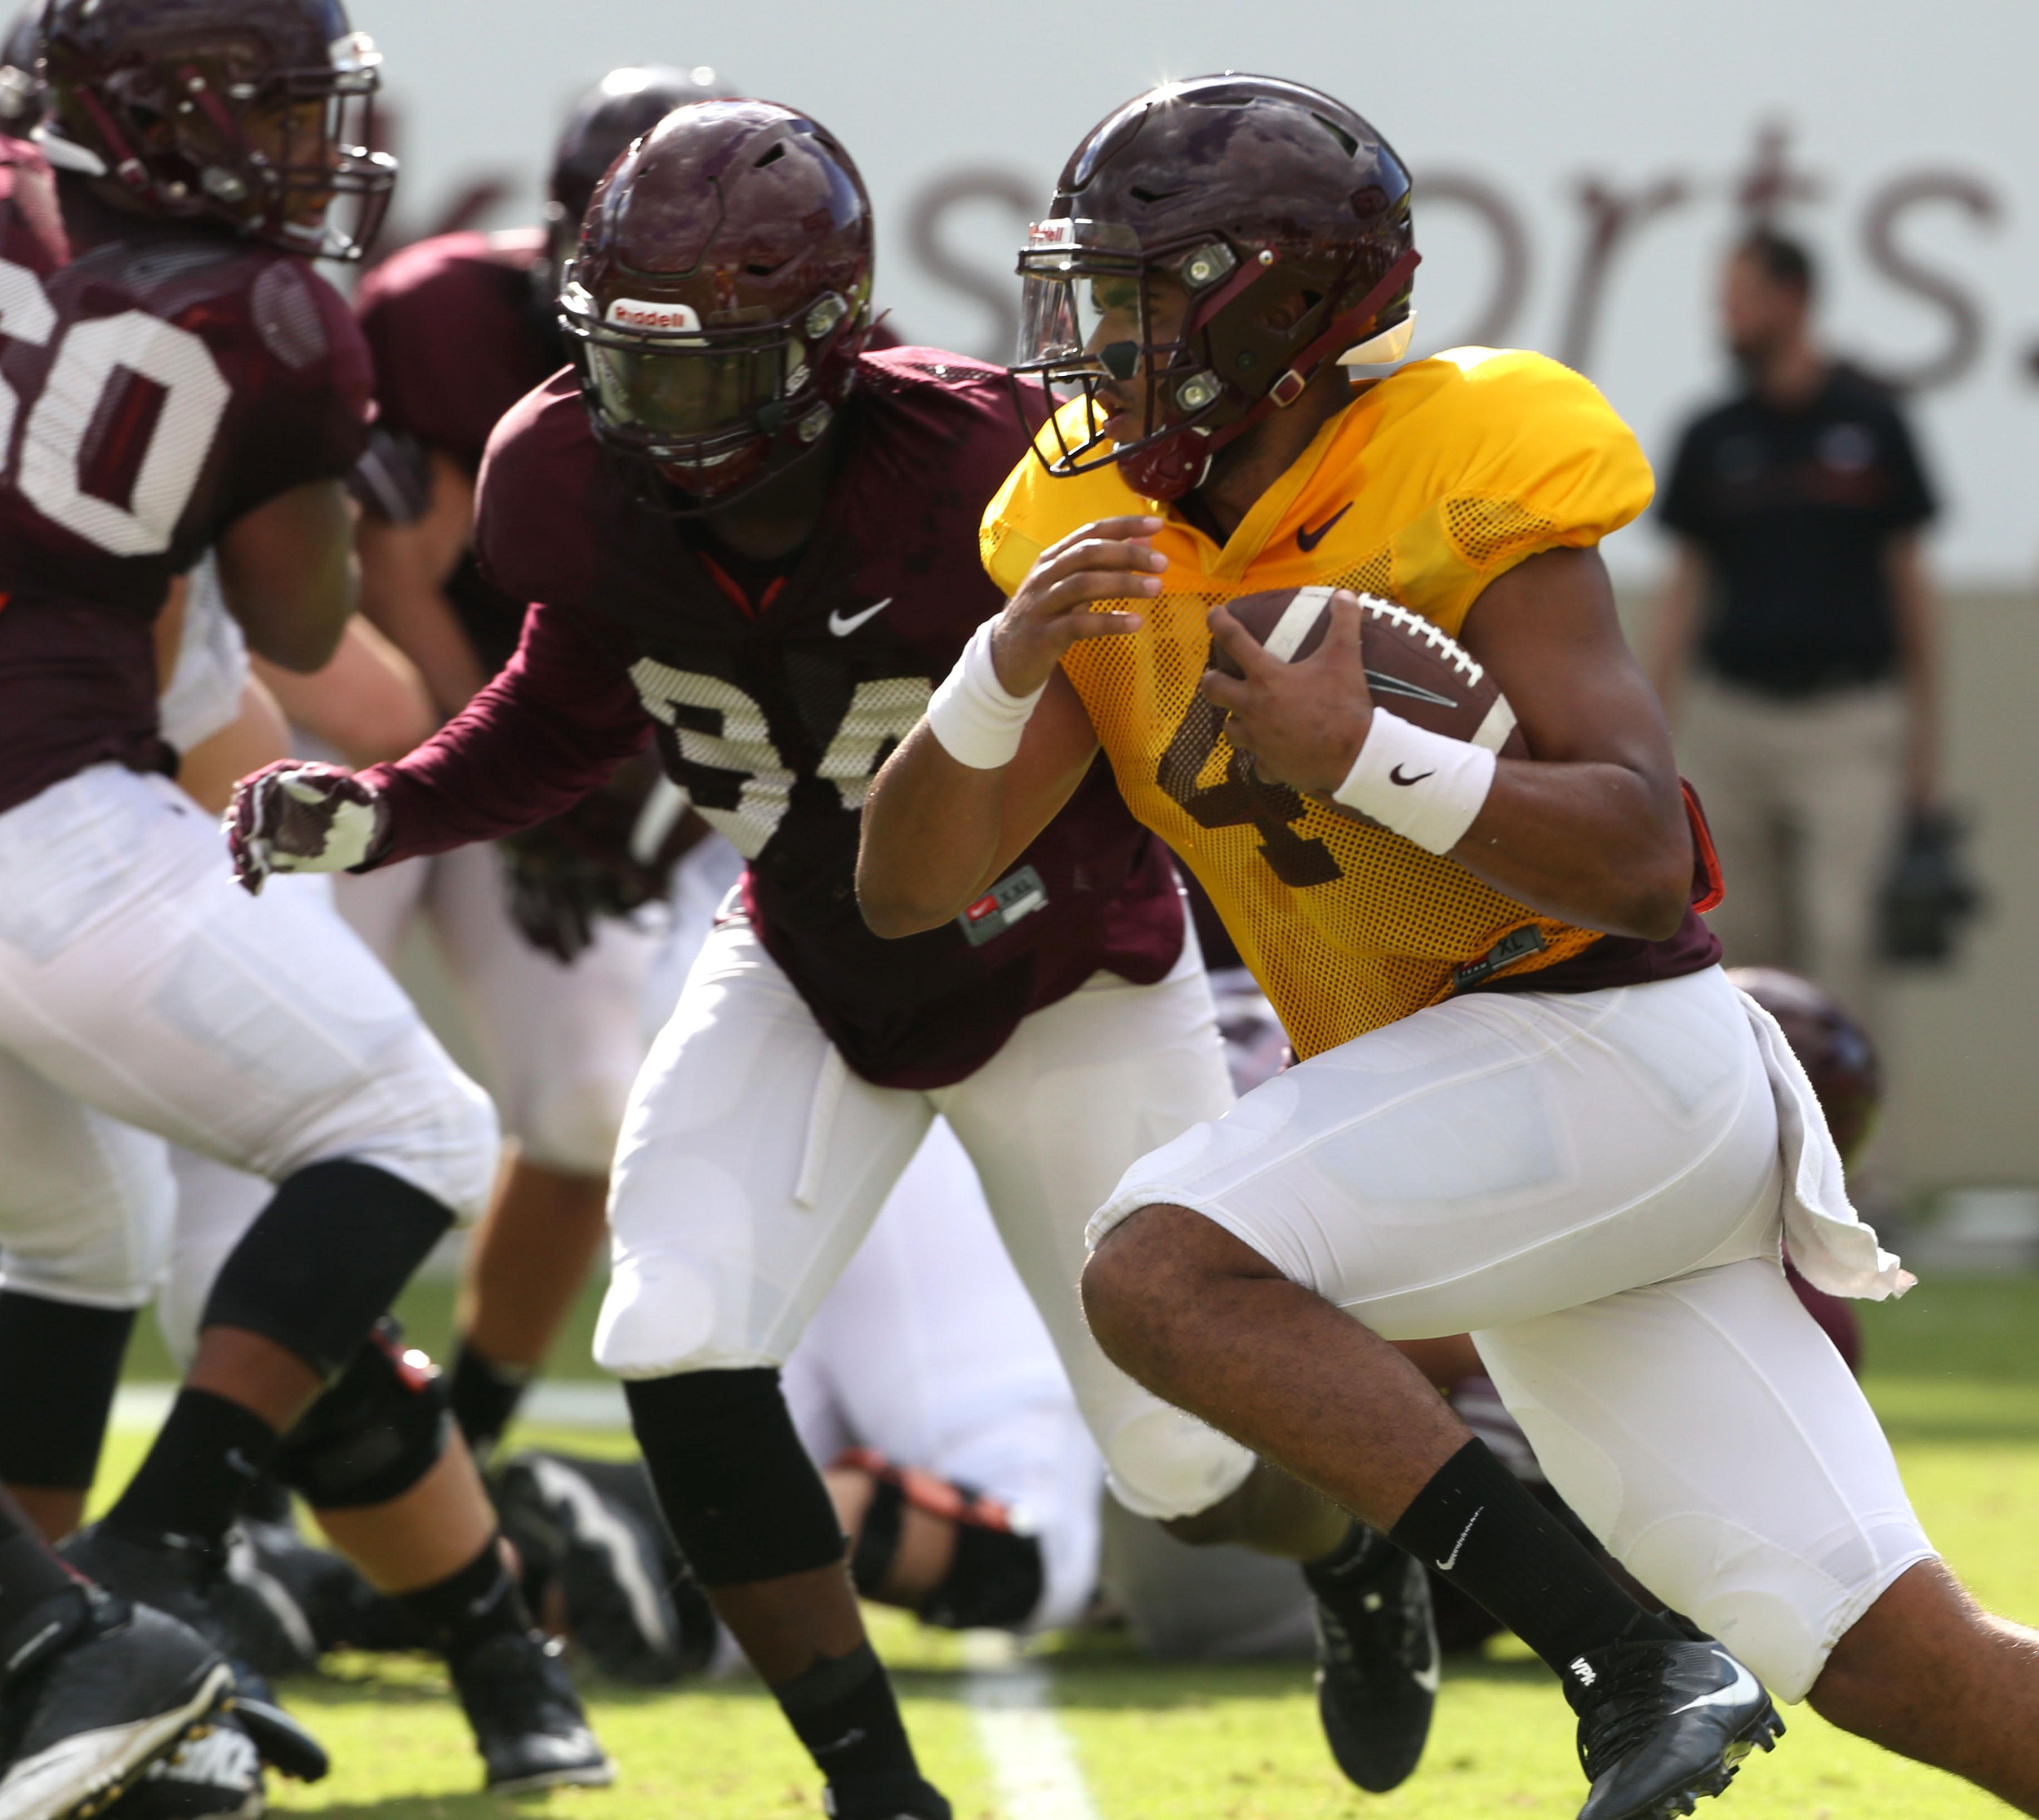 Virginia Tech quarterback Jerod Evans (4) runs the ball during the NCAA college football team's practice Tuesday, Aug. 23, 2016, in Blacksburg, Va. (Matt Gentry/The Roanoke Times via AP)